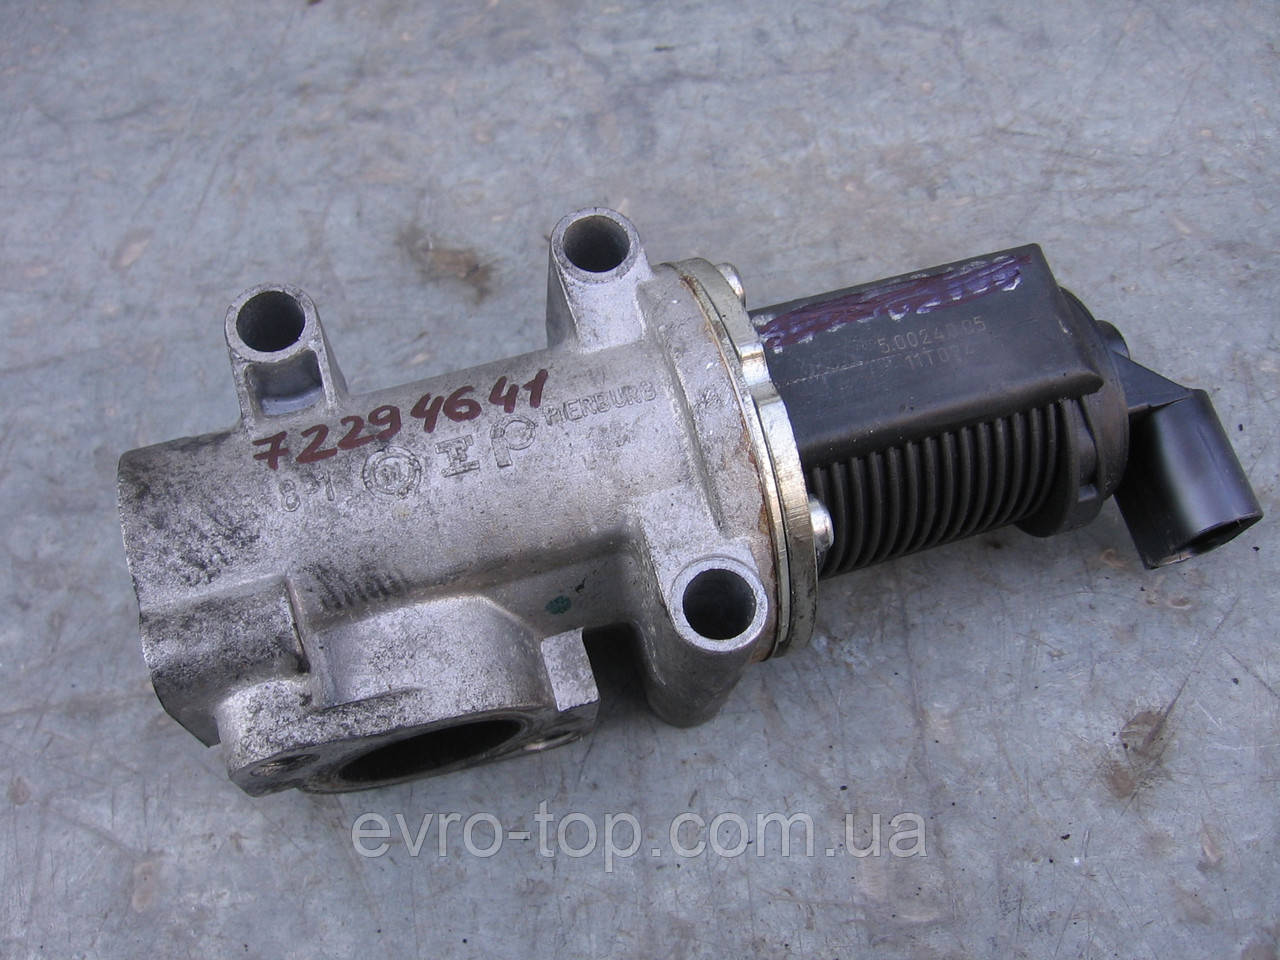 Клапан EGR 72294641 б/у 1.9cdti на Opel: Astra H, Signum, Vectra C, Zafira B  2004-2017 года